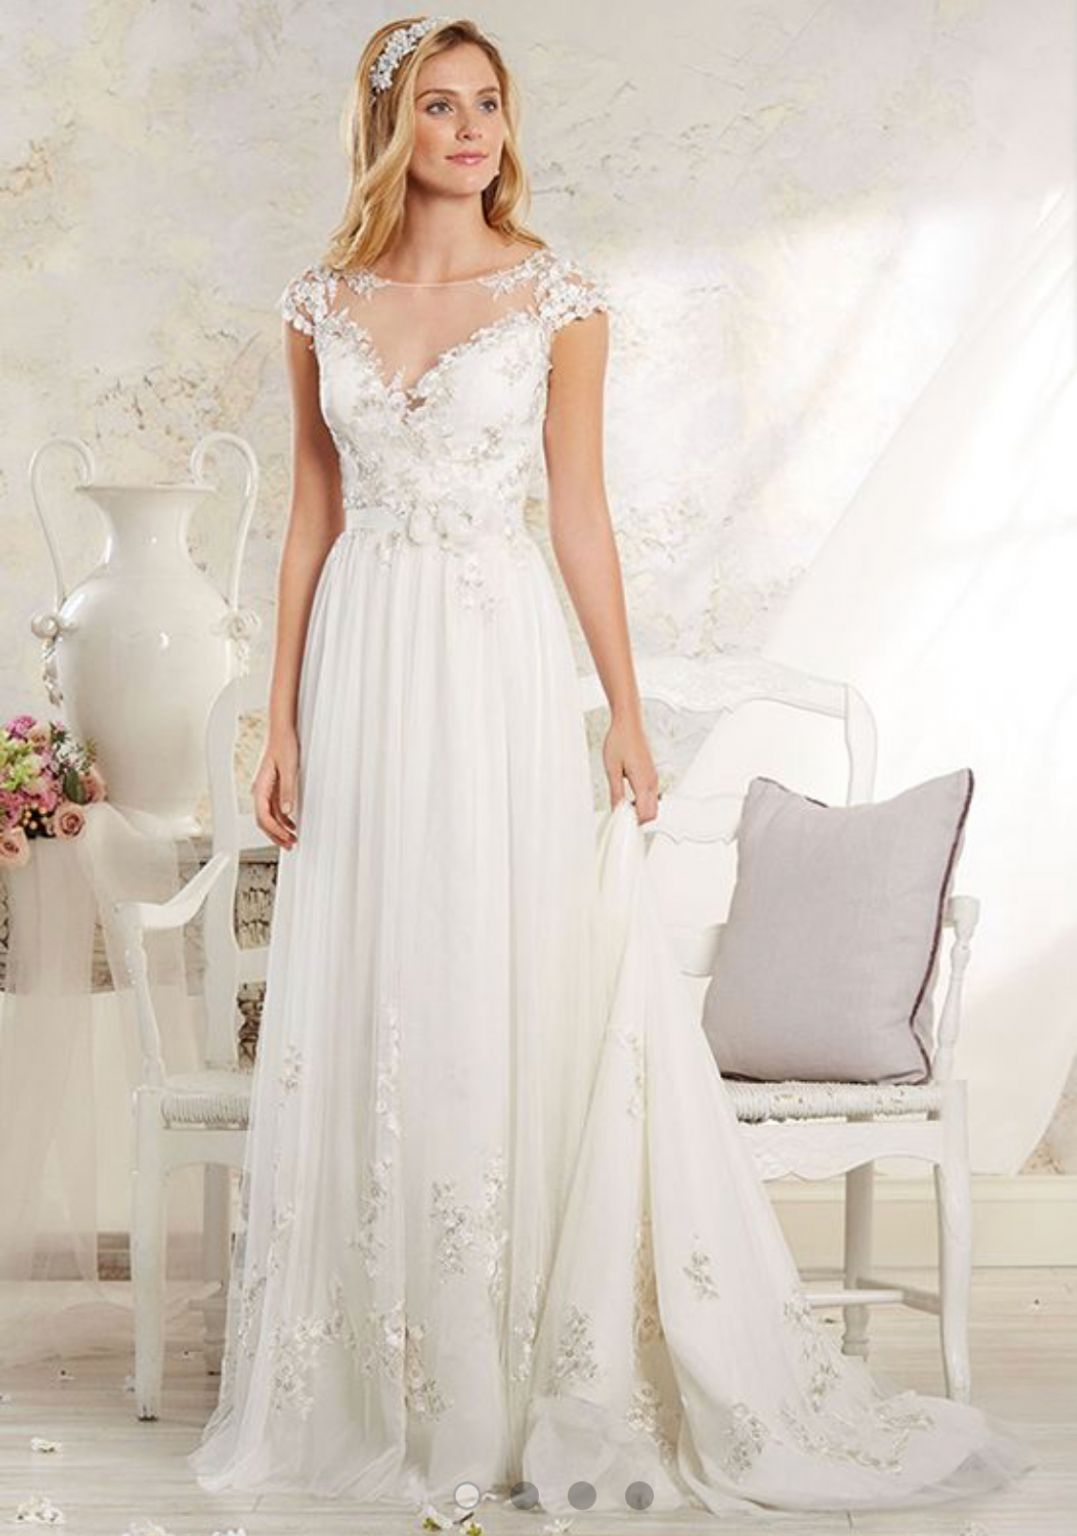 Alfred angelo size sample wedding dresses